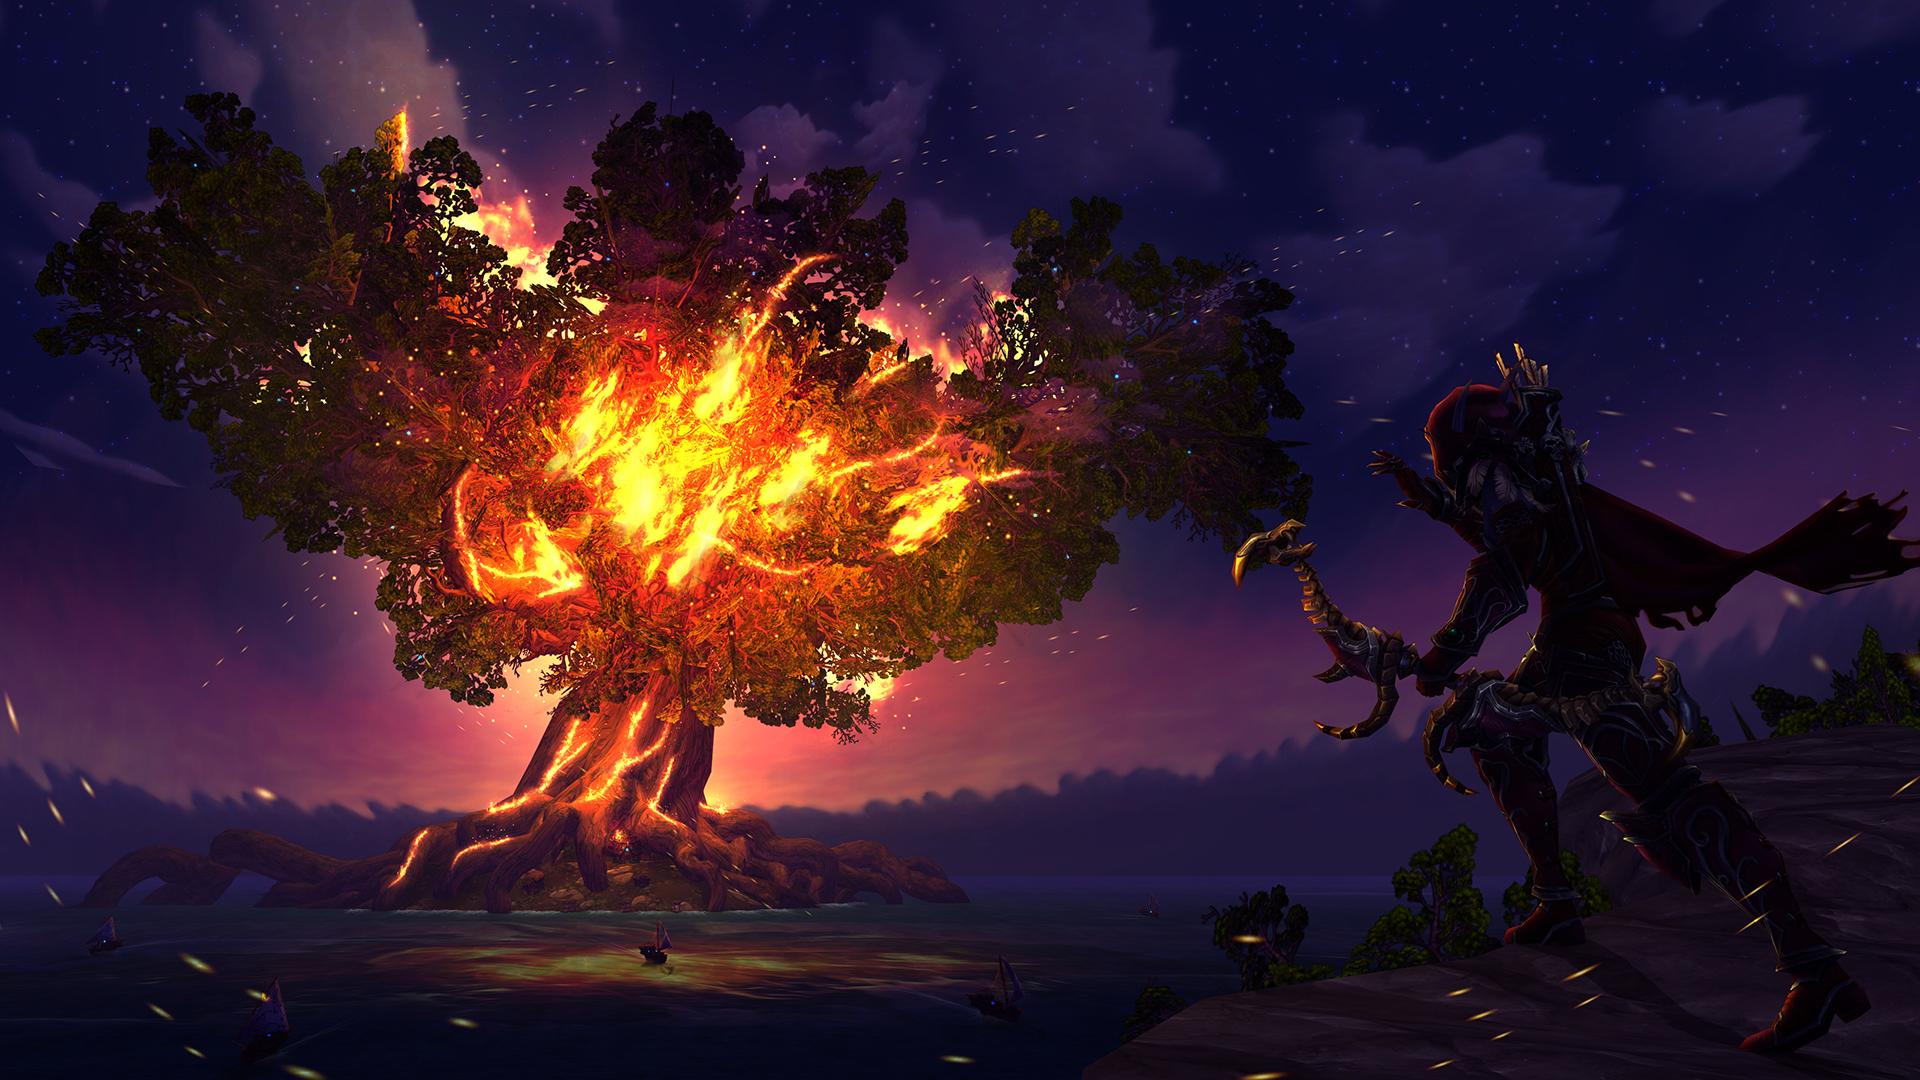 World Of Warcraft The Dark Portal Uhd 4k Wallpaper: World Of Warcraft HD Wallpaper